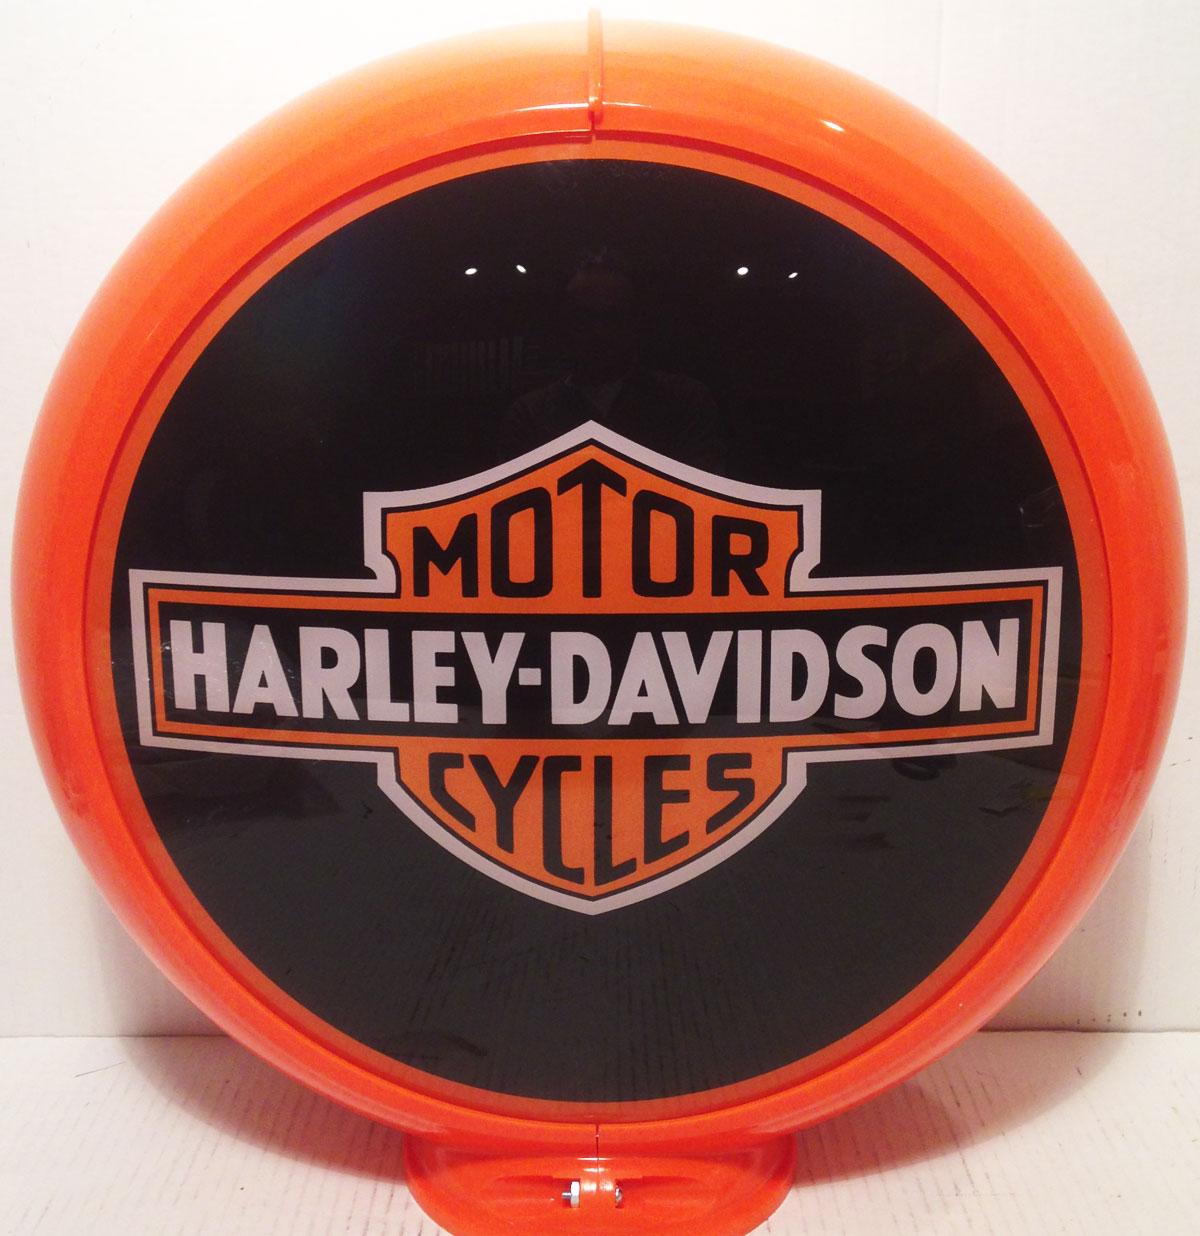 Harley-Davidson benzinepomp bol